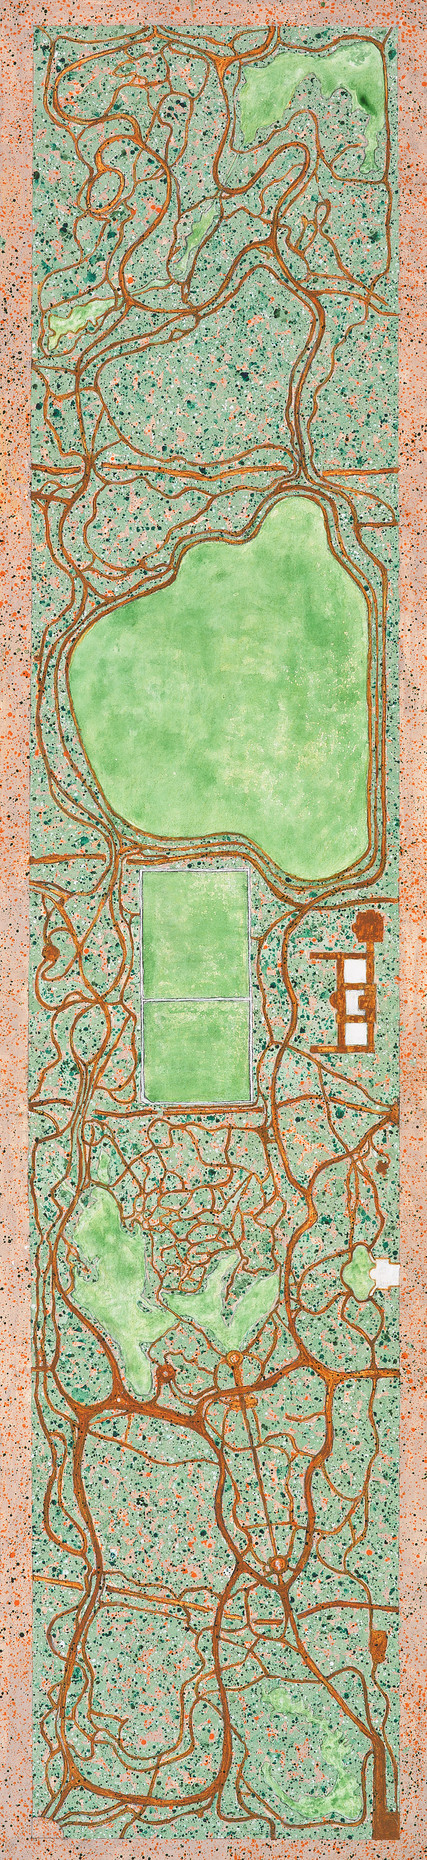 Central Park (Map of Central Park #1)